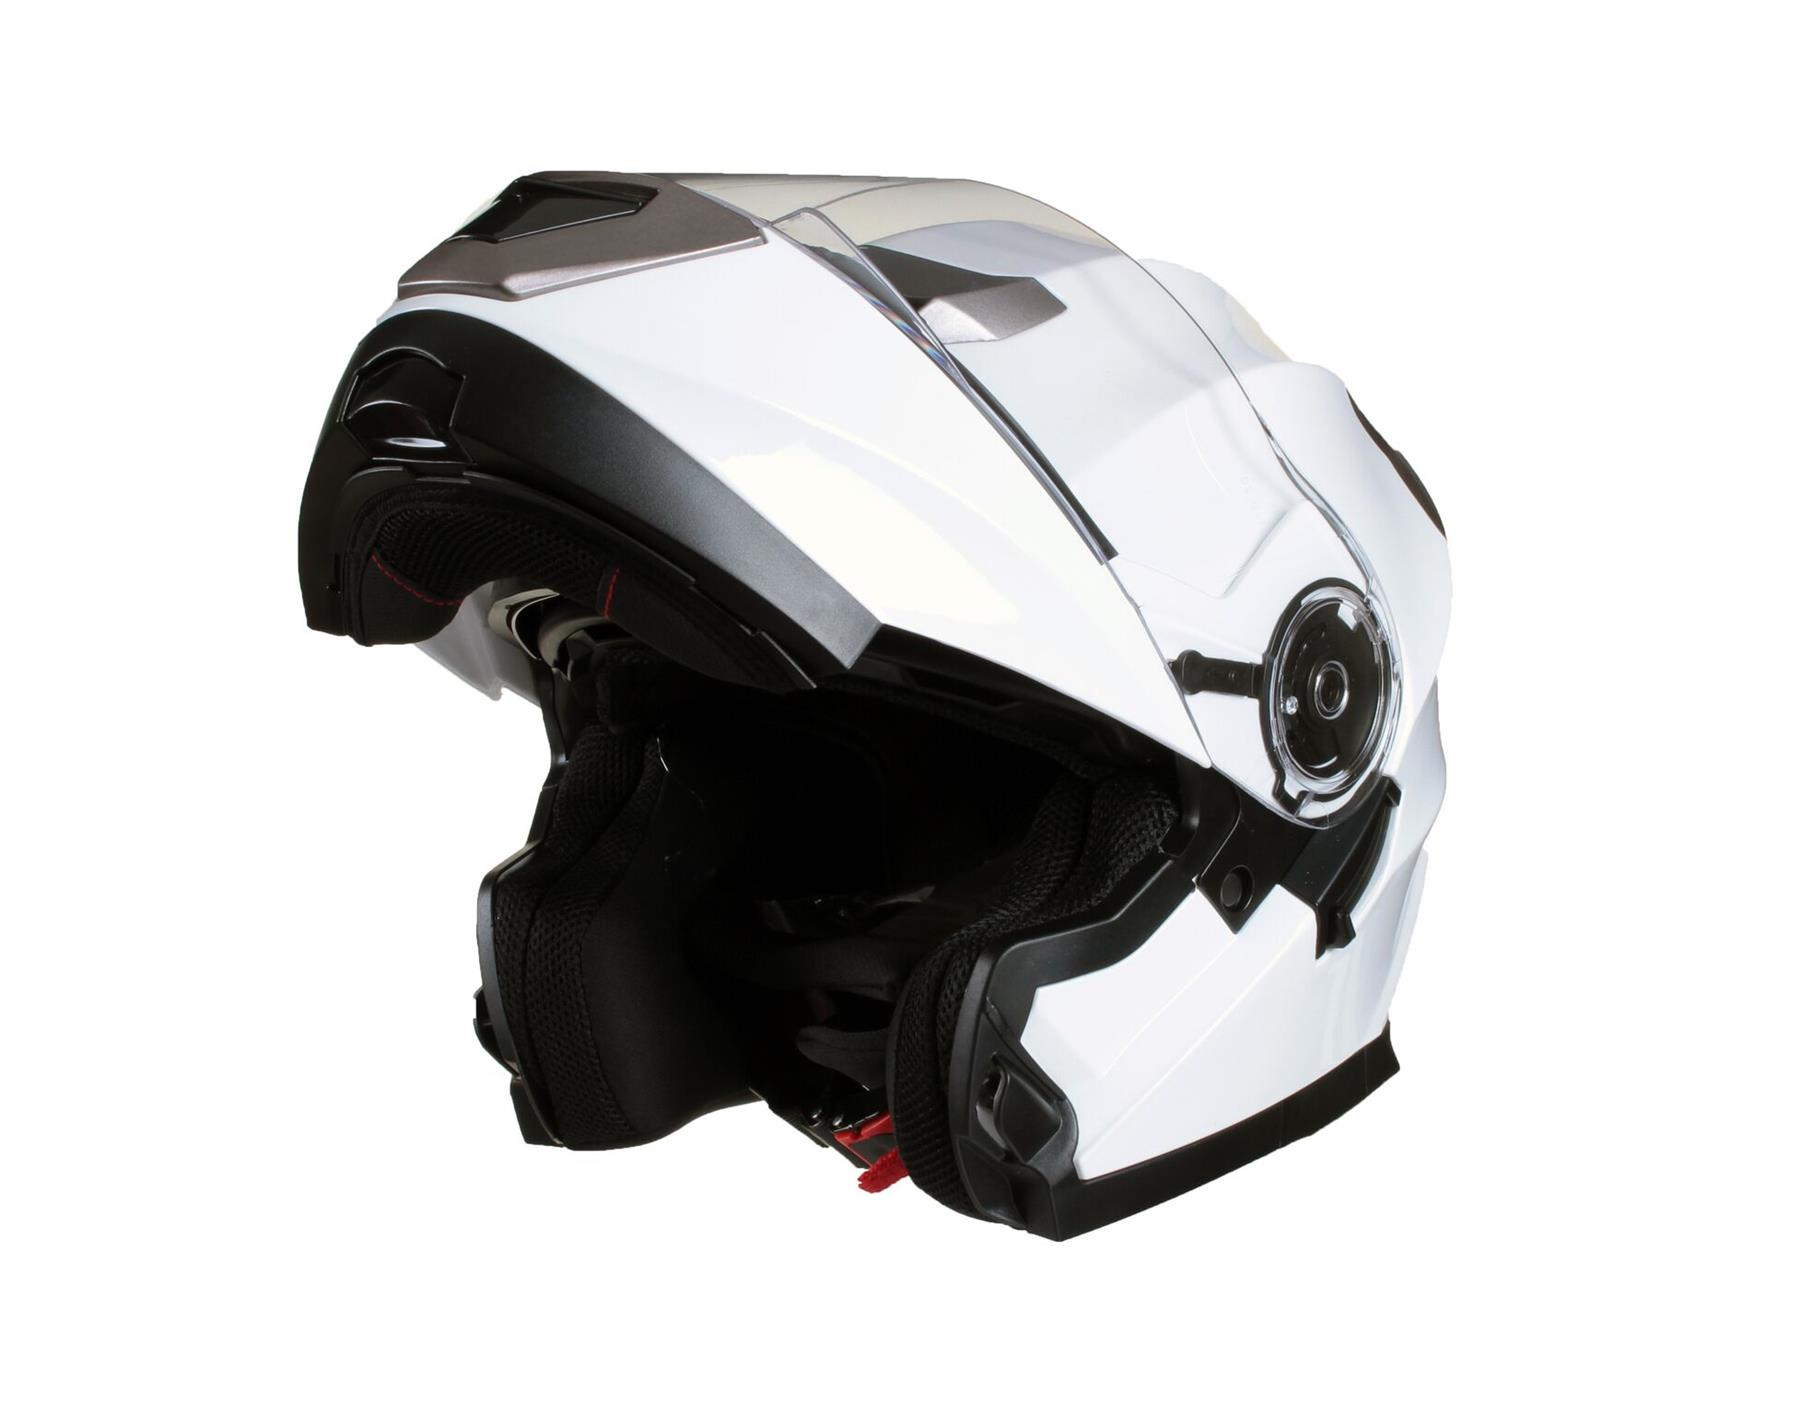 MODULAR-Flip-up-Front-Helmet-DOUBLE-Visor-MOTORCYCLE-Motorbike-Colour-CHOICE miniature 7